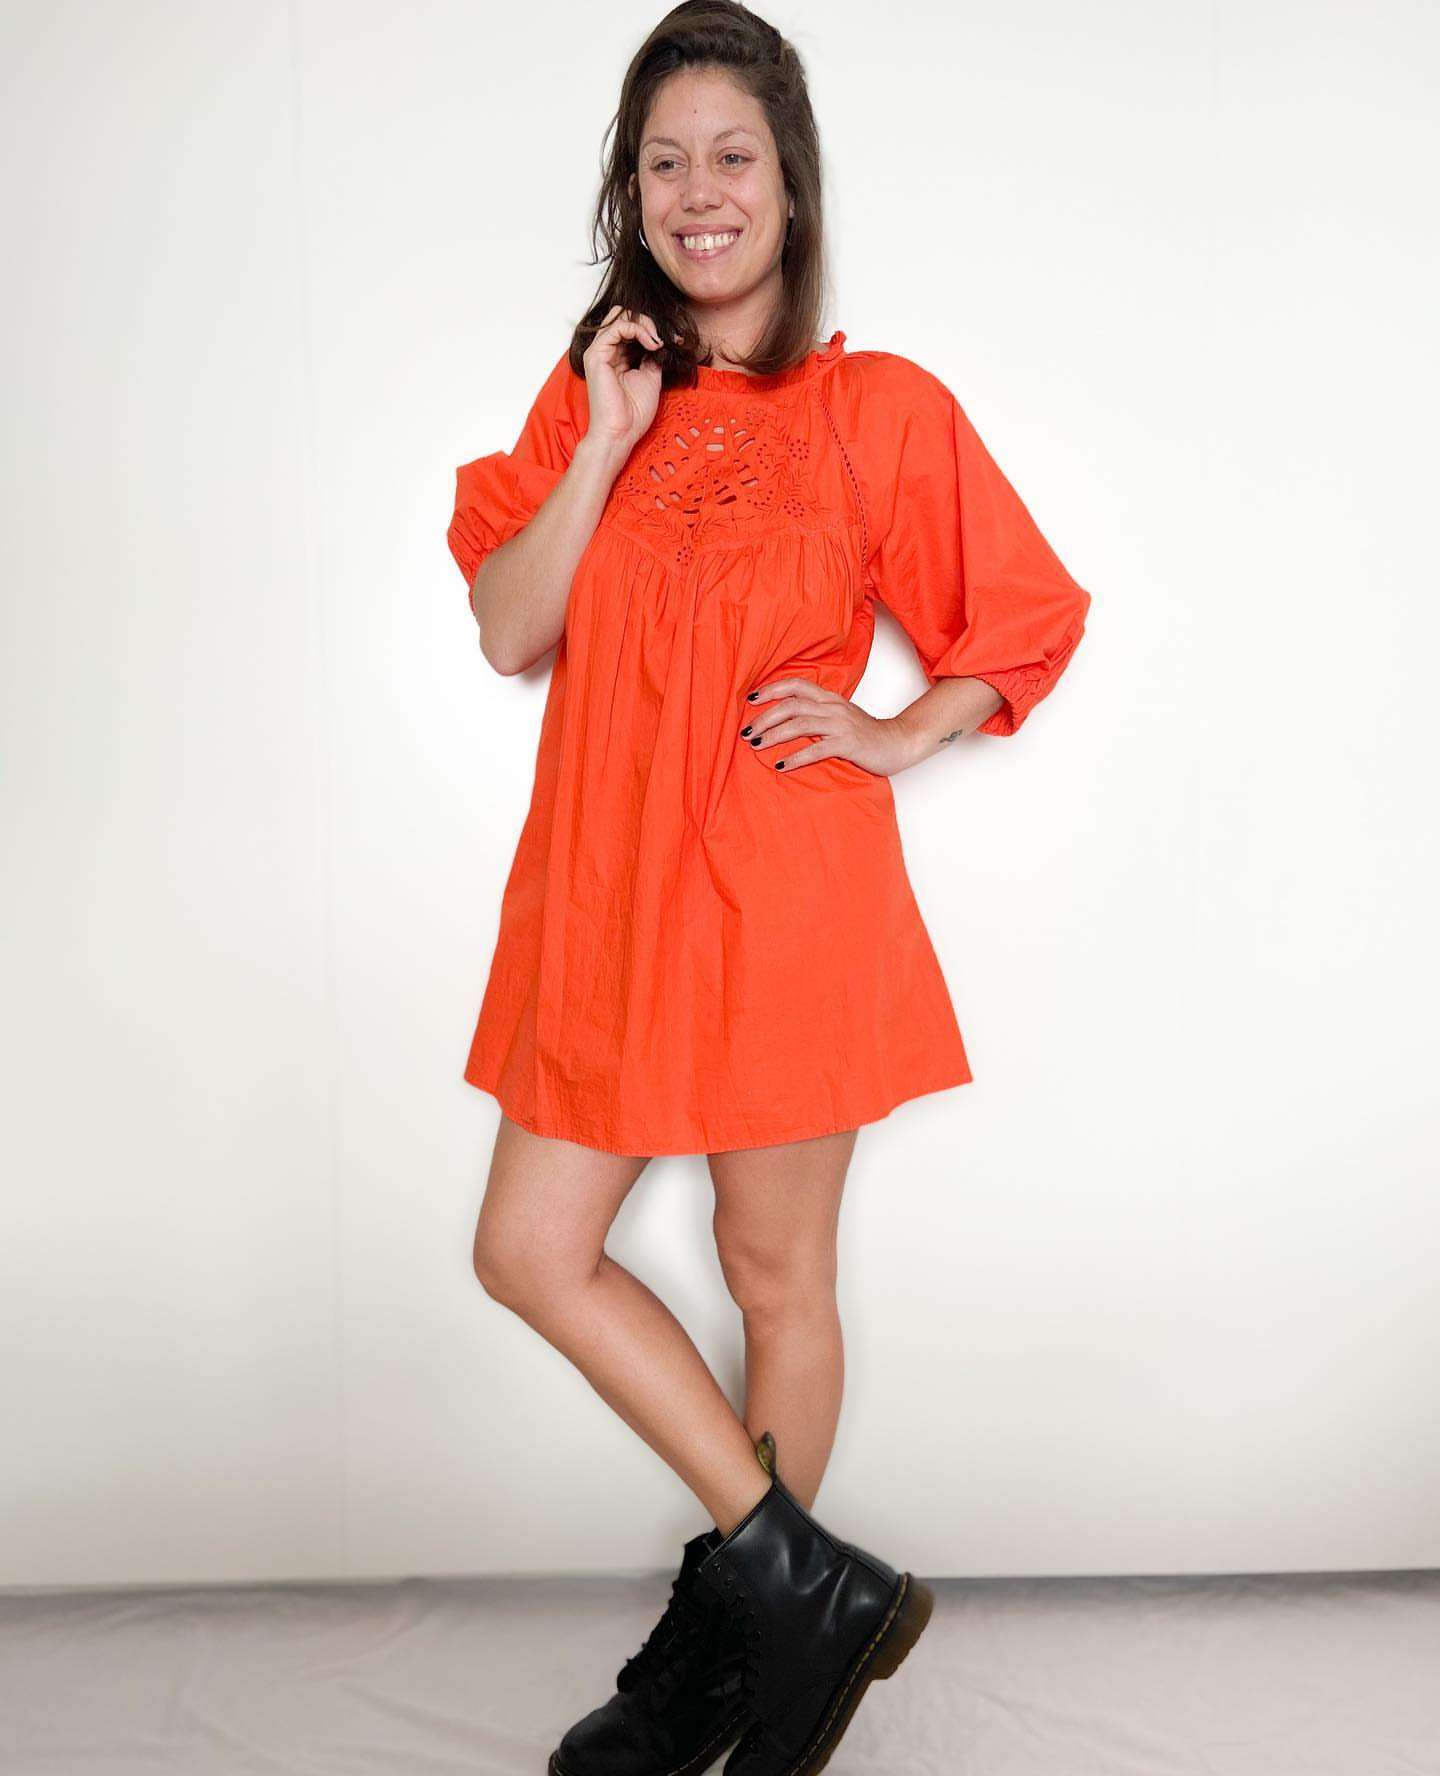 tuti.tieppo 1592064924 1 - Cómo encontrar nuestro estilo personal - Valeria Berrini